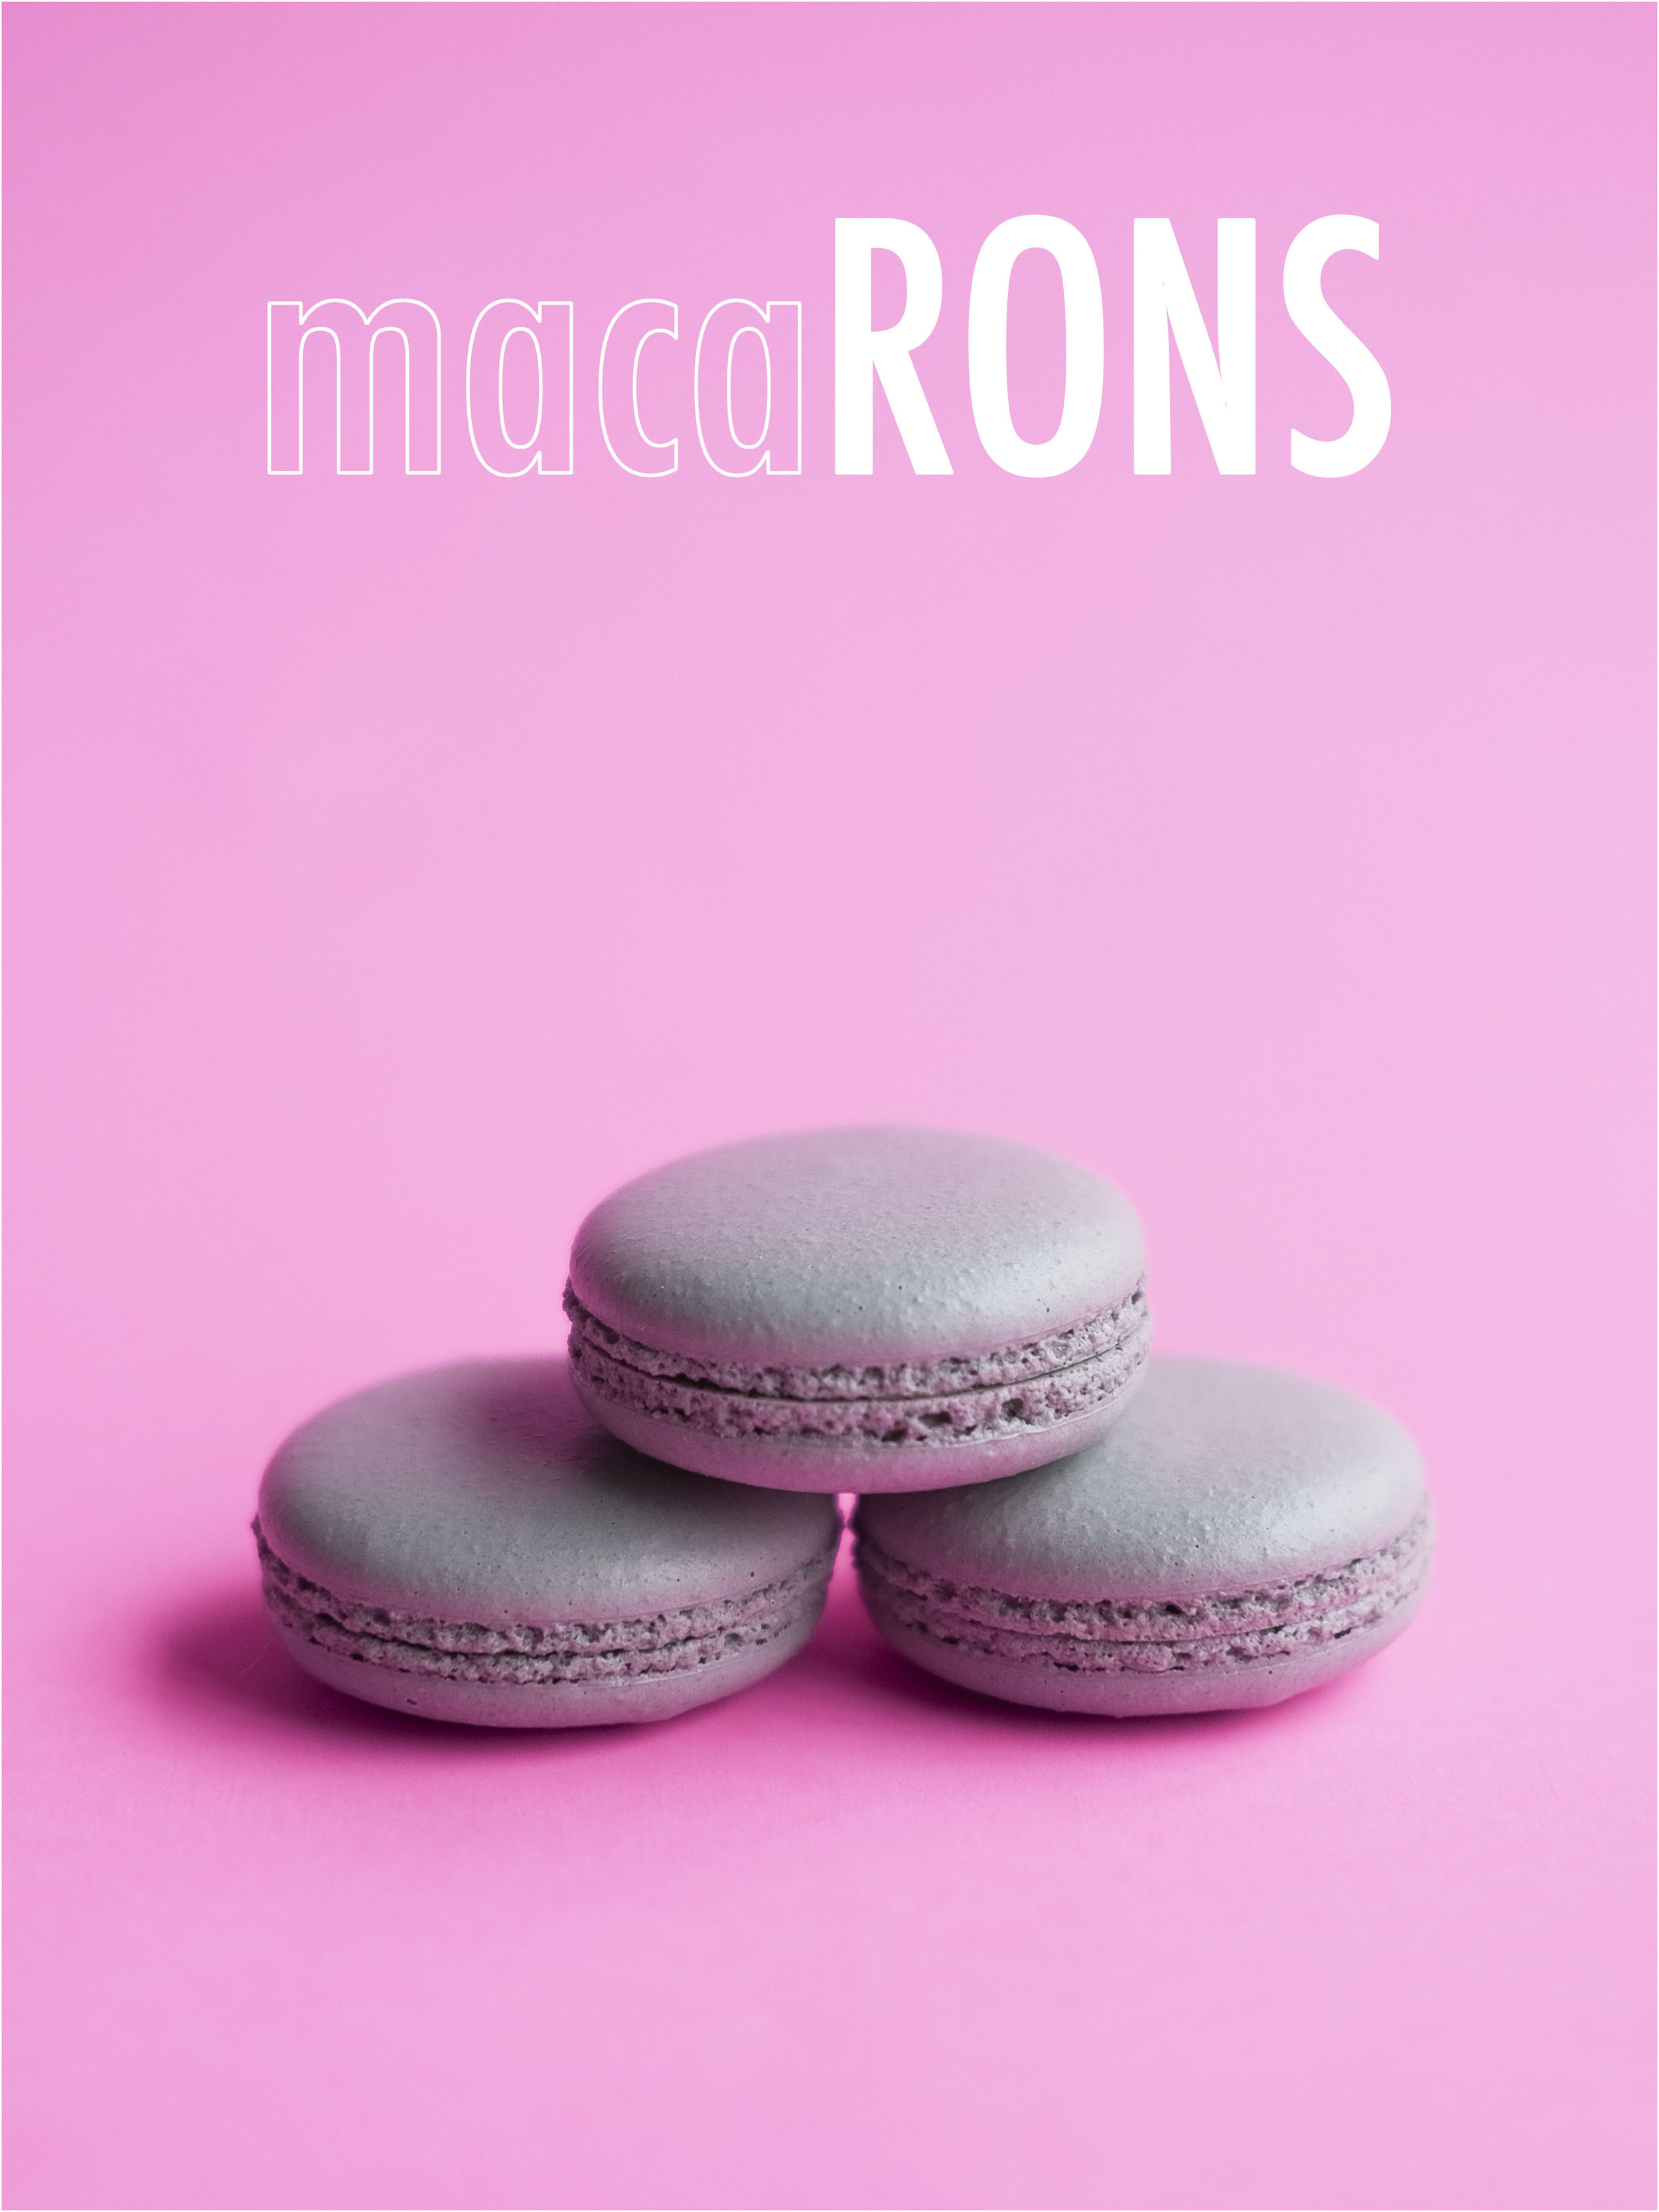 How do you pronounce Macaron | English, American, French